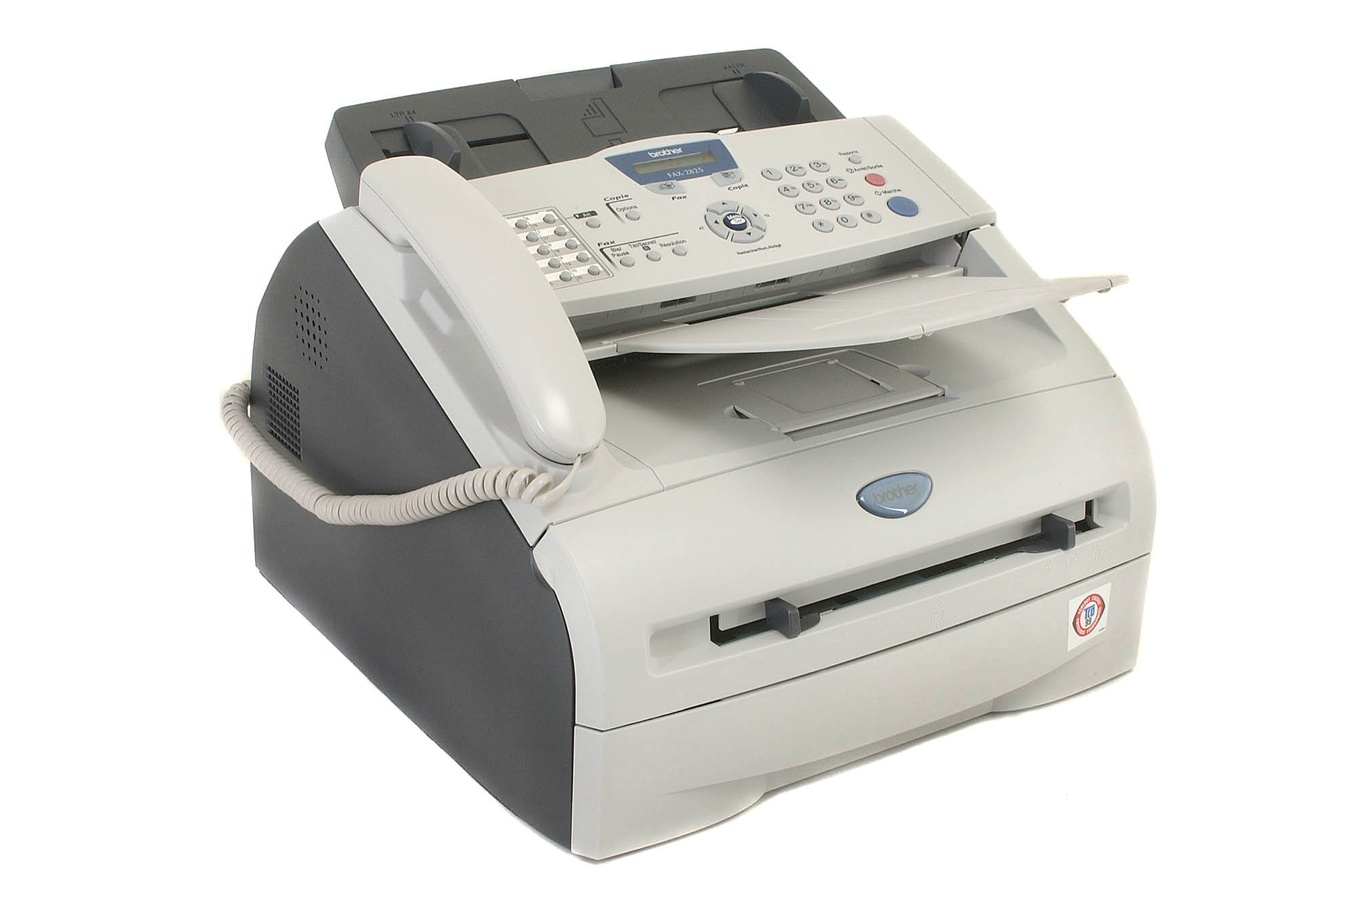 Принтер Brother FAX-2825